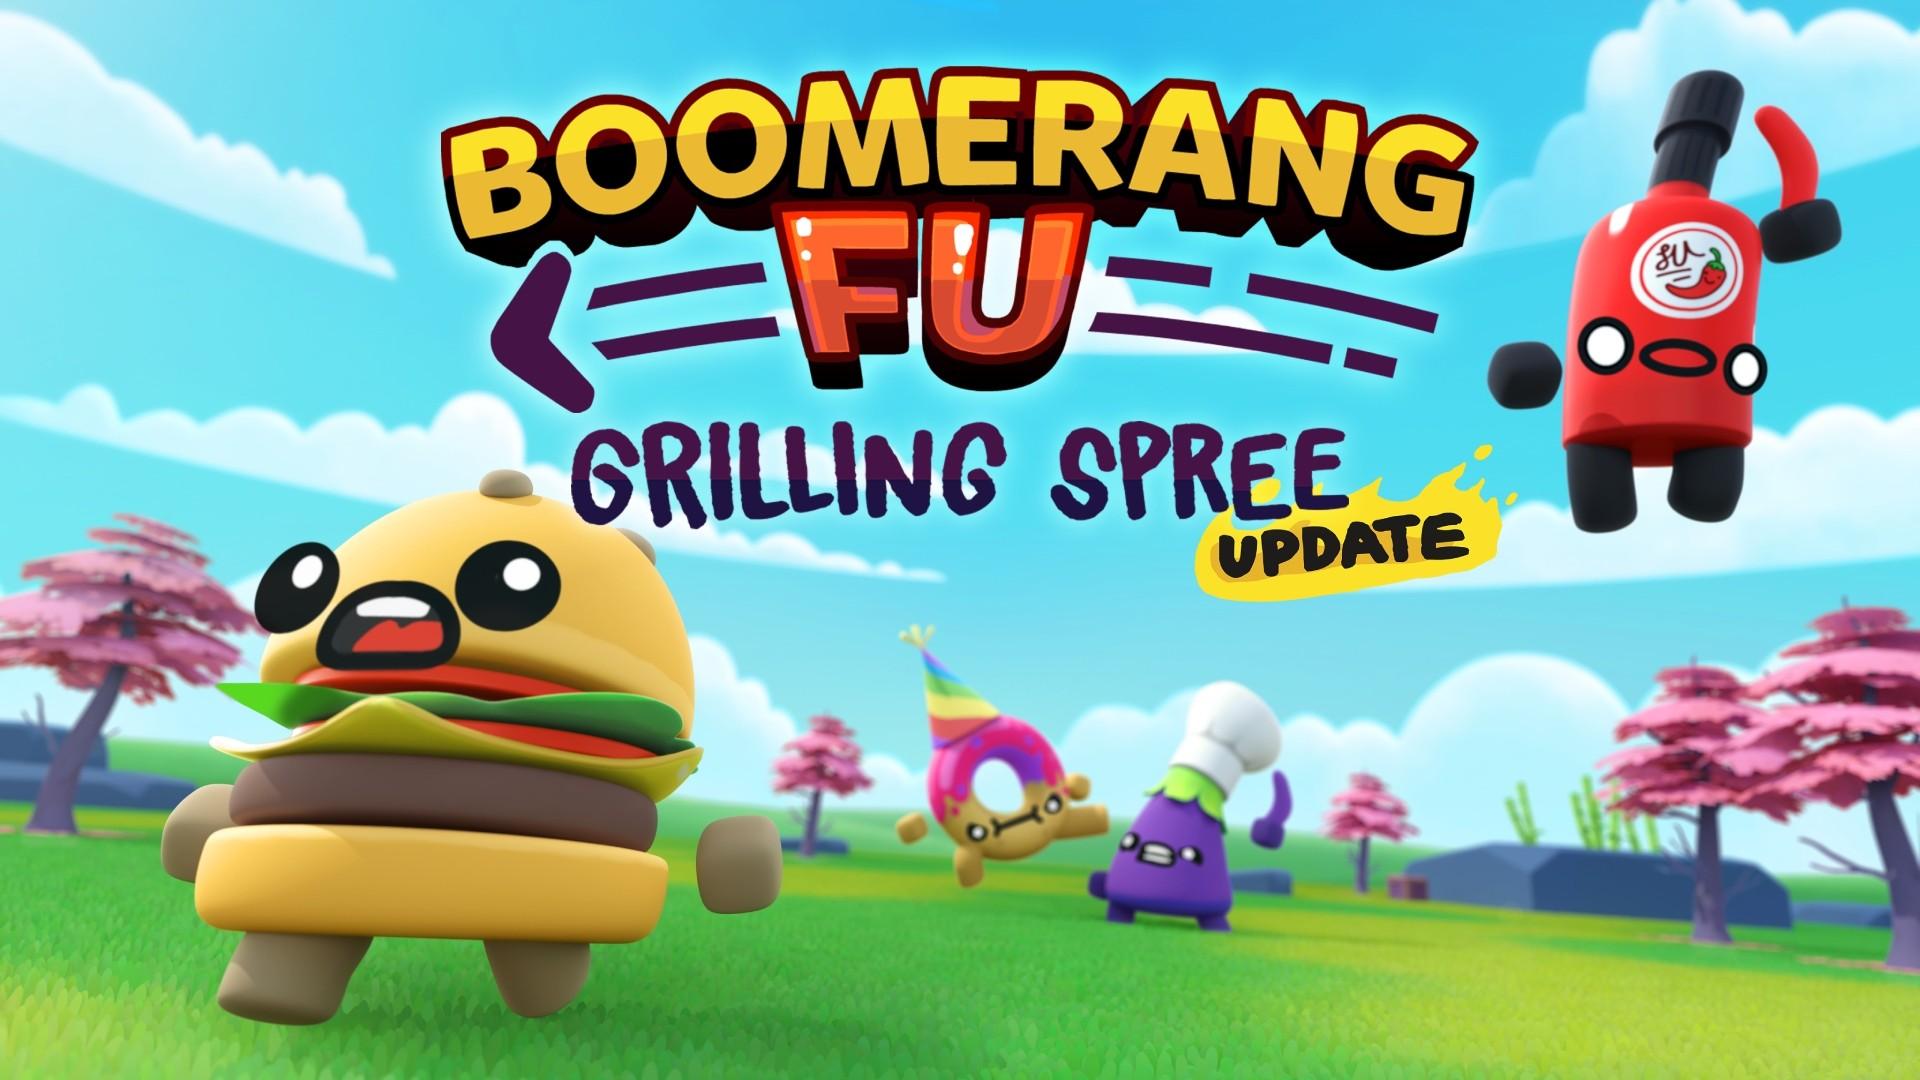 Boomerang Fu: Grilling Spree Update